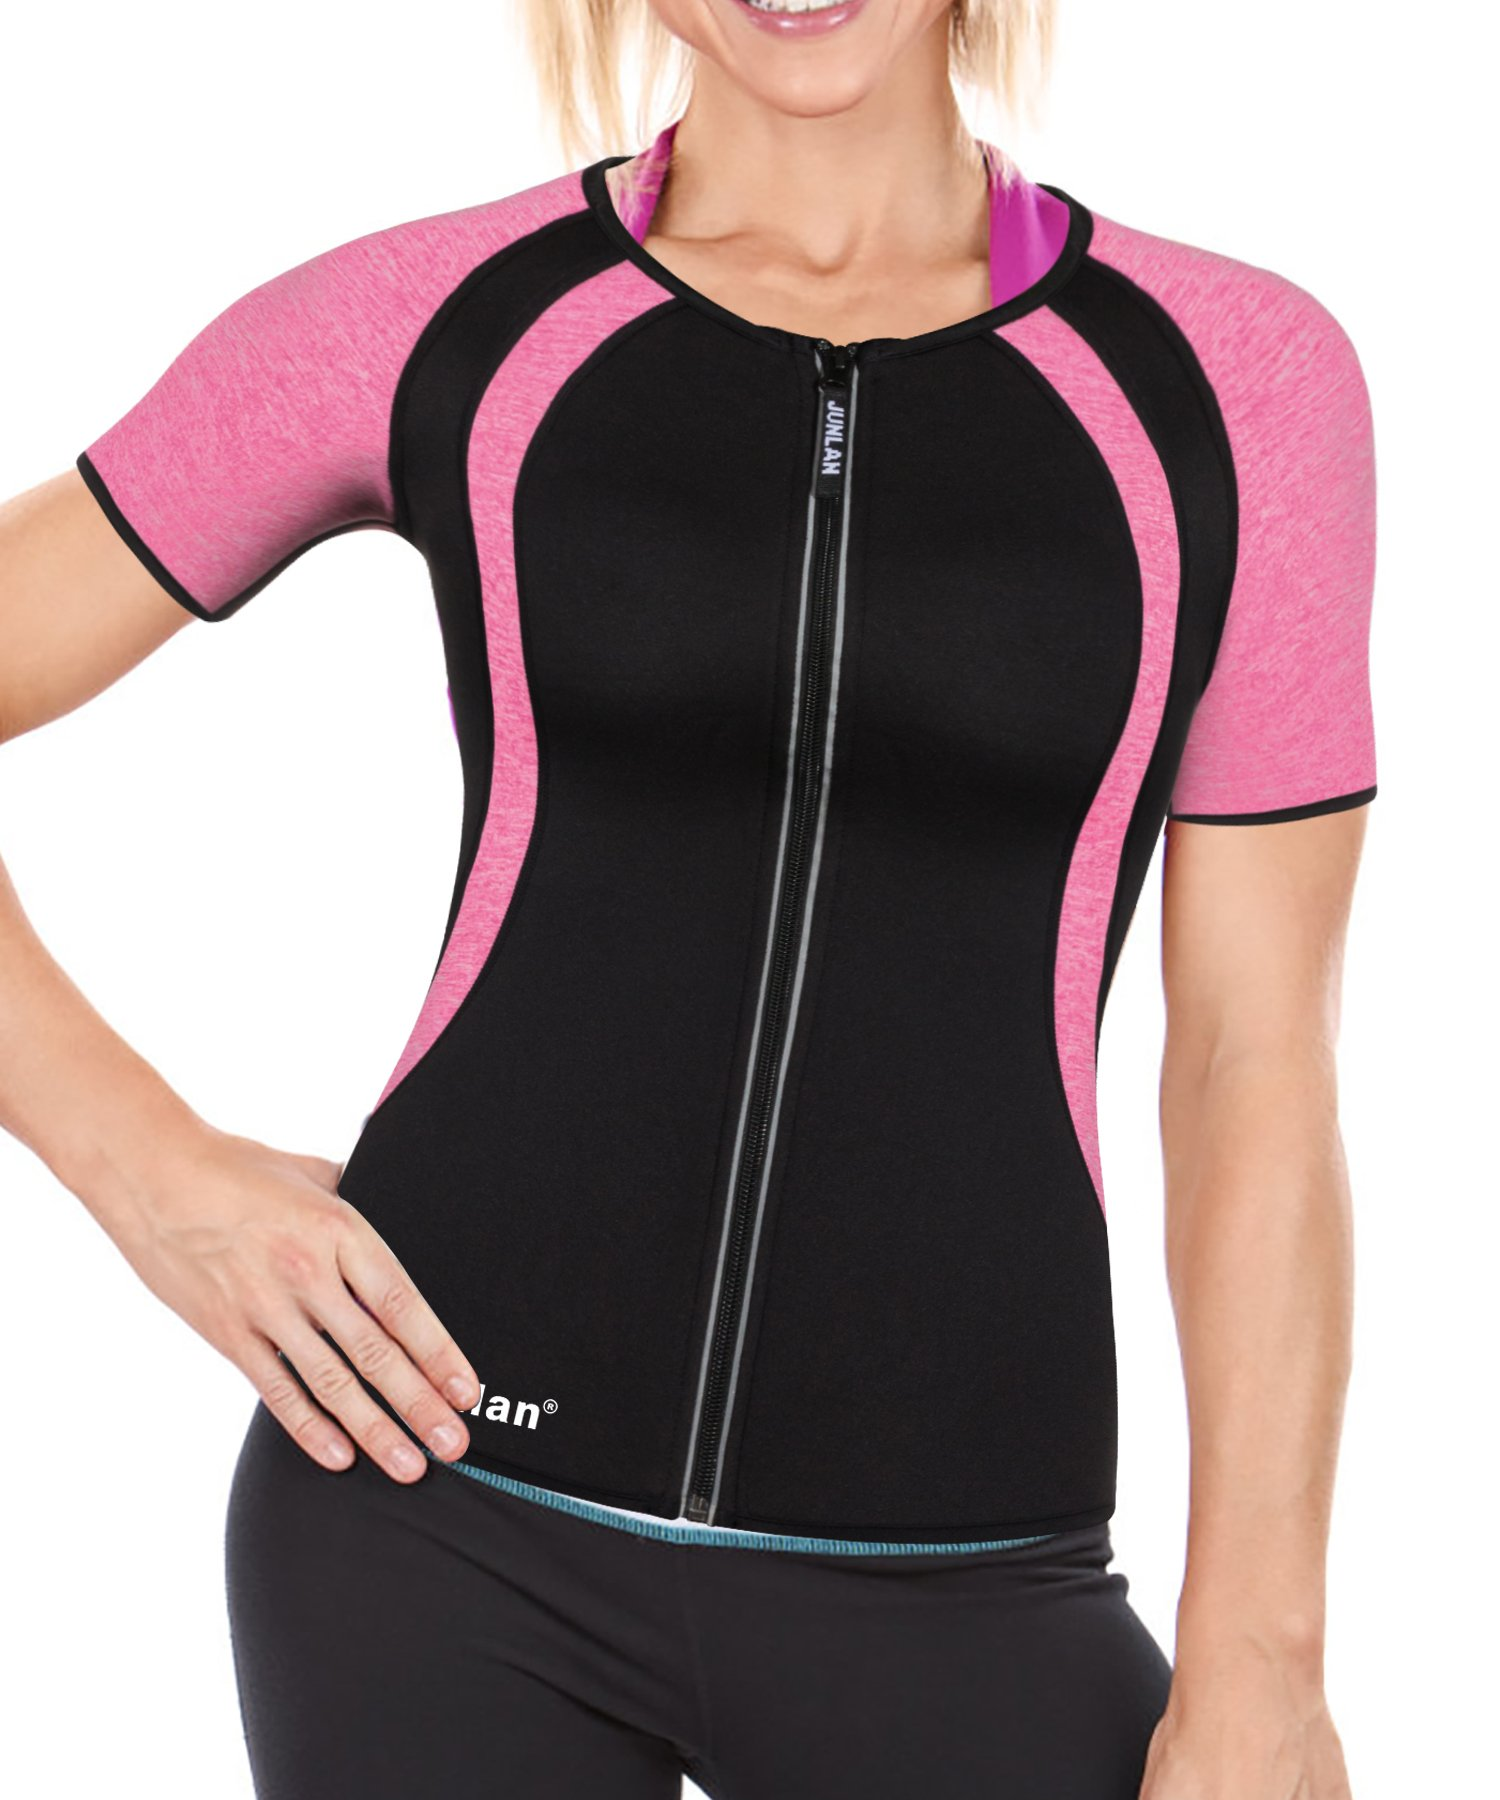 Neoprene Hot Sweat Sauna Body Shapers T-Shirts Zipper Slimming Weight Loss Gym Yoga Sports Fitness Short Sleeve Shirts (Sauna Suit Black, XXL) by Junlan